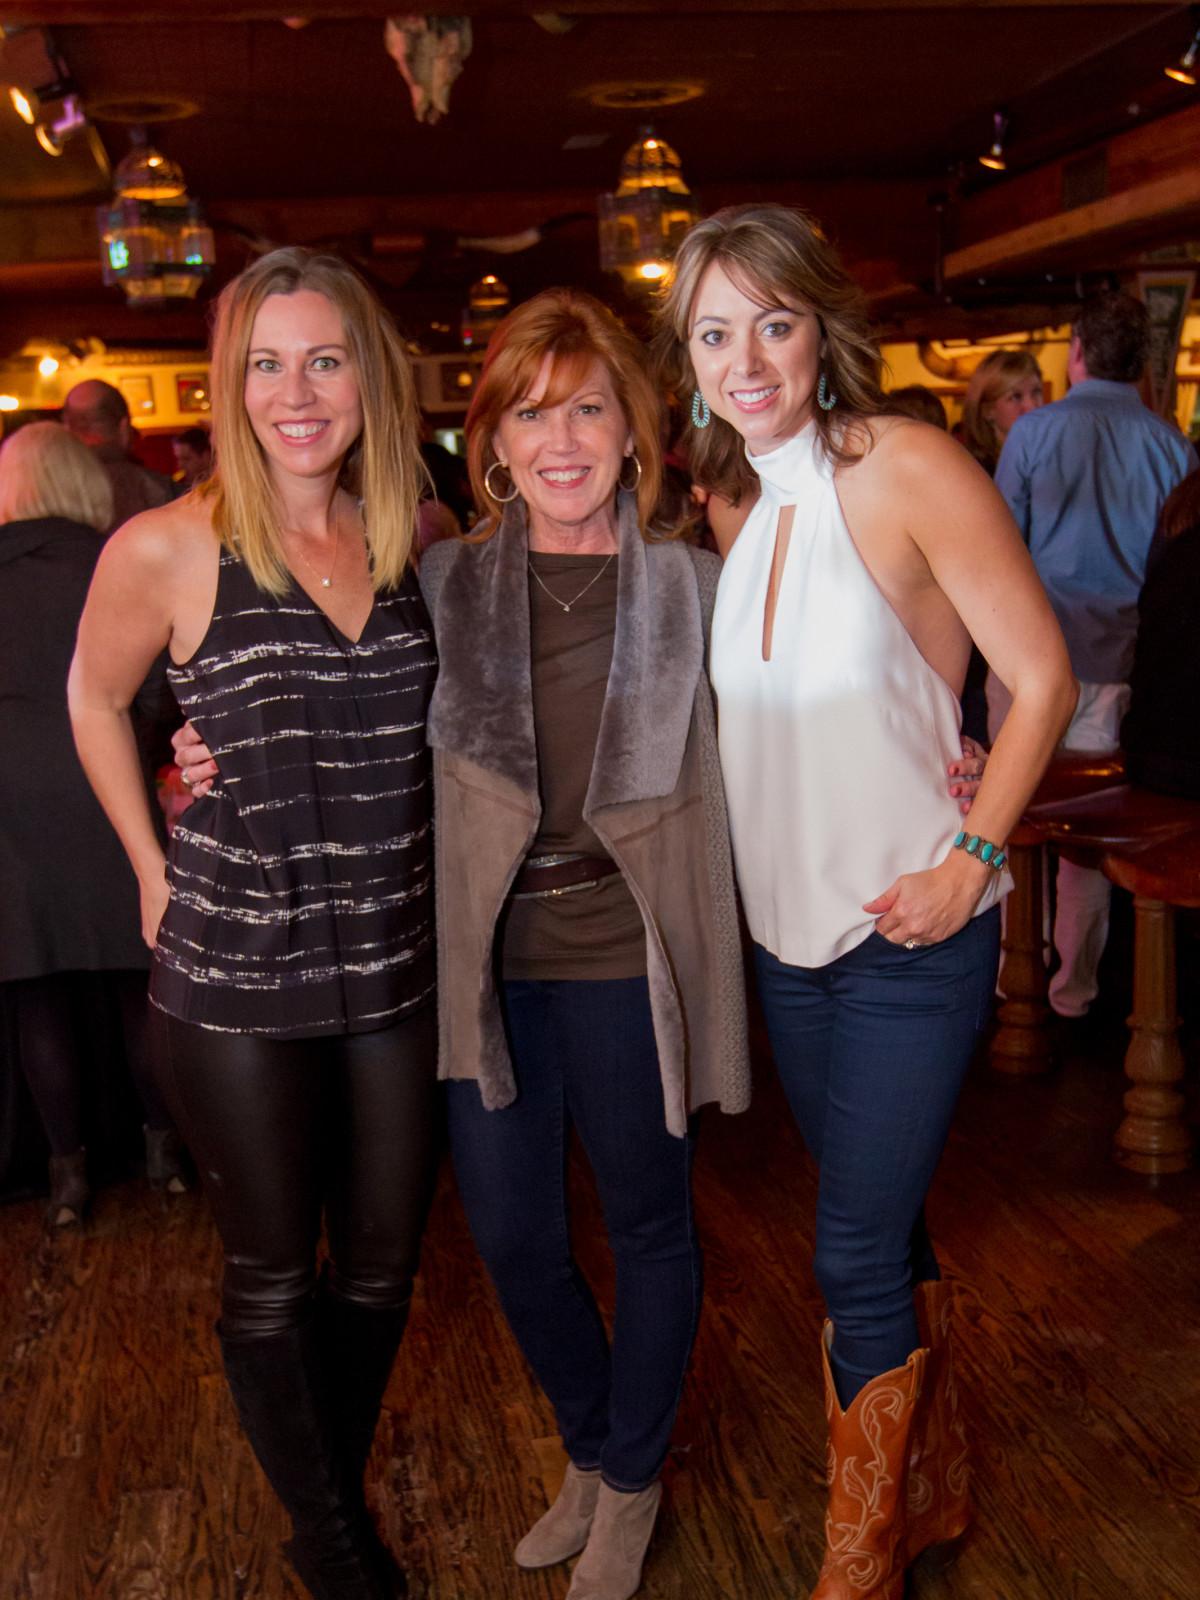 Cattle Barons Gentlemans Committe, Feb. 2016 Allison Flikerski, Gigi Harbison, Lauren Maloy